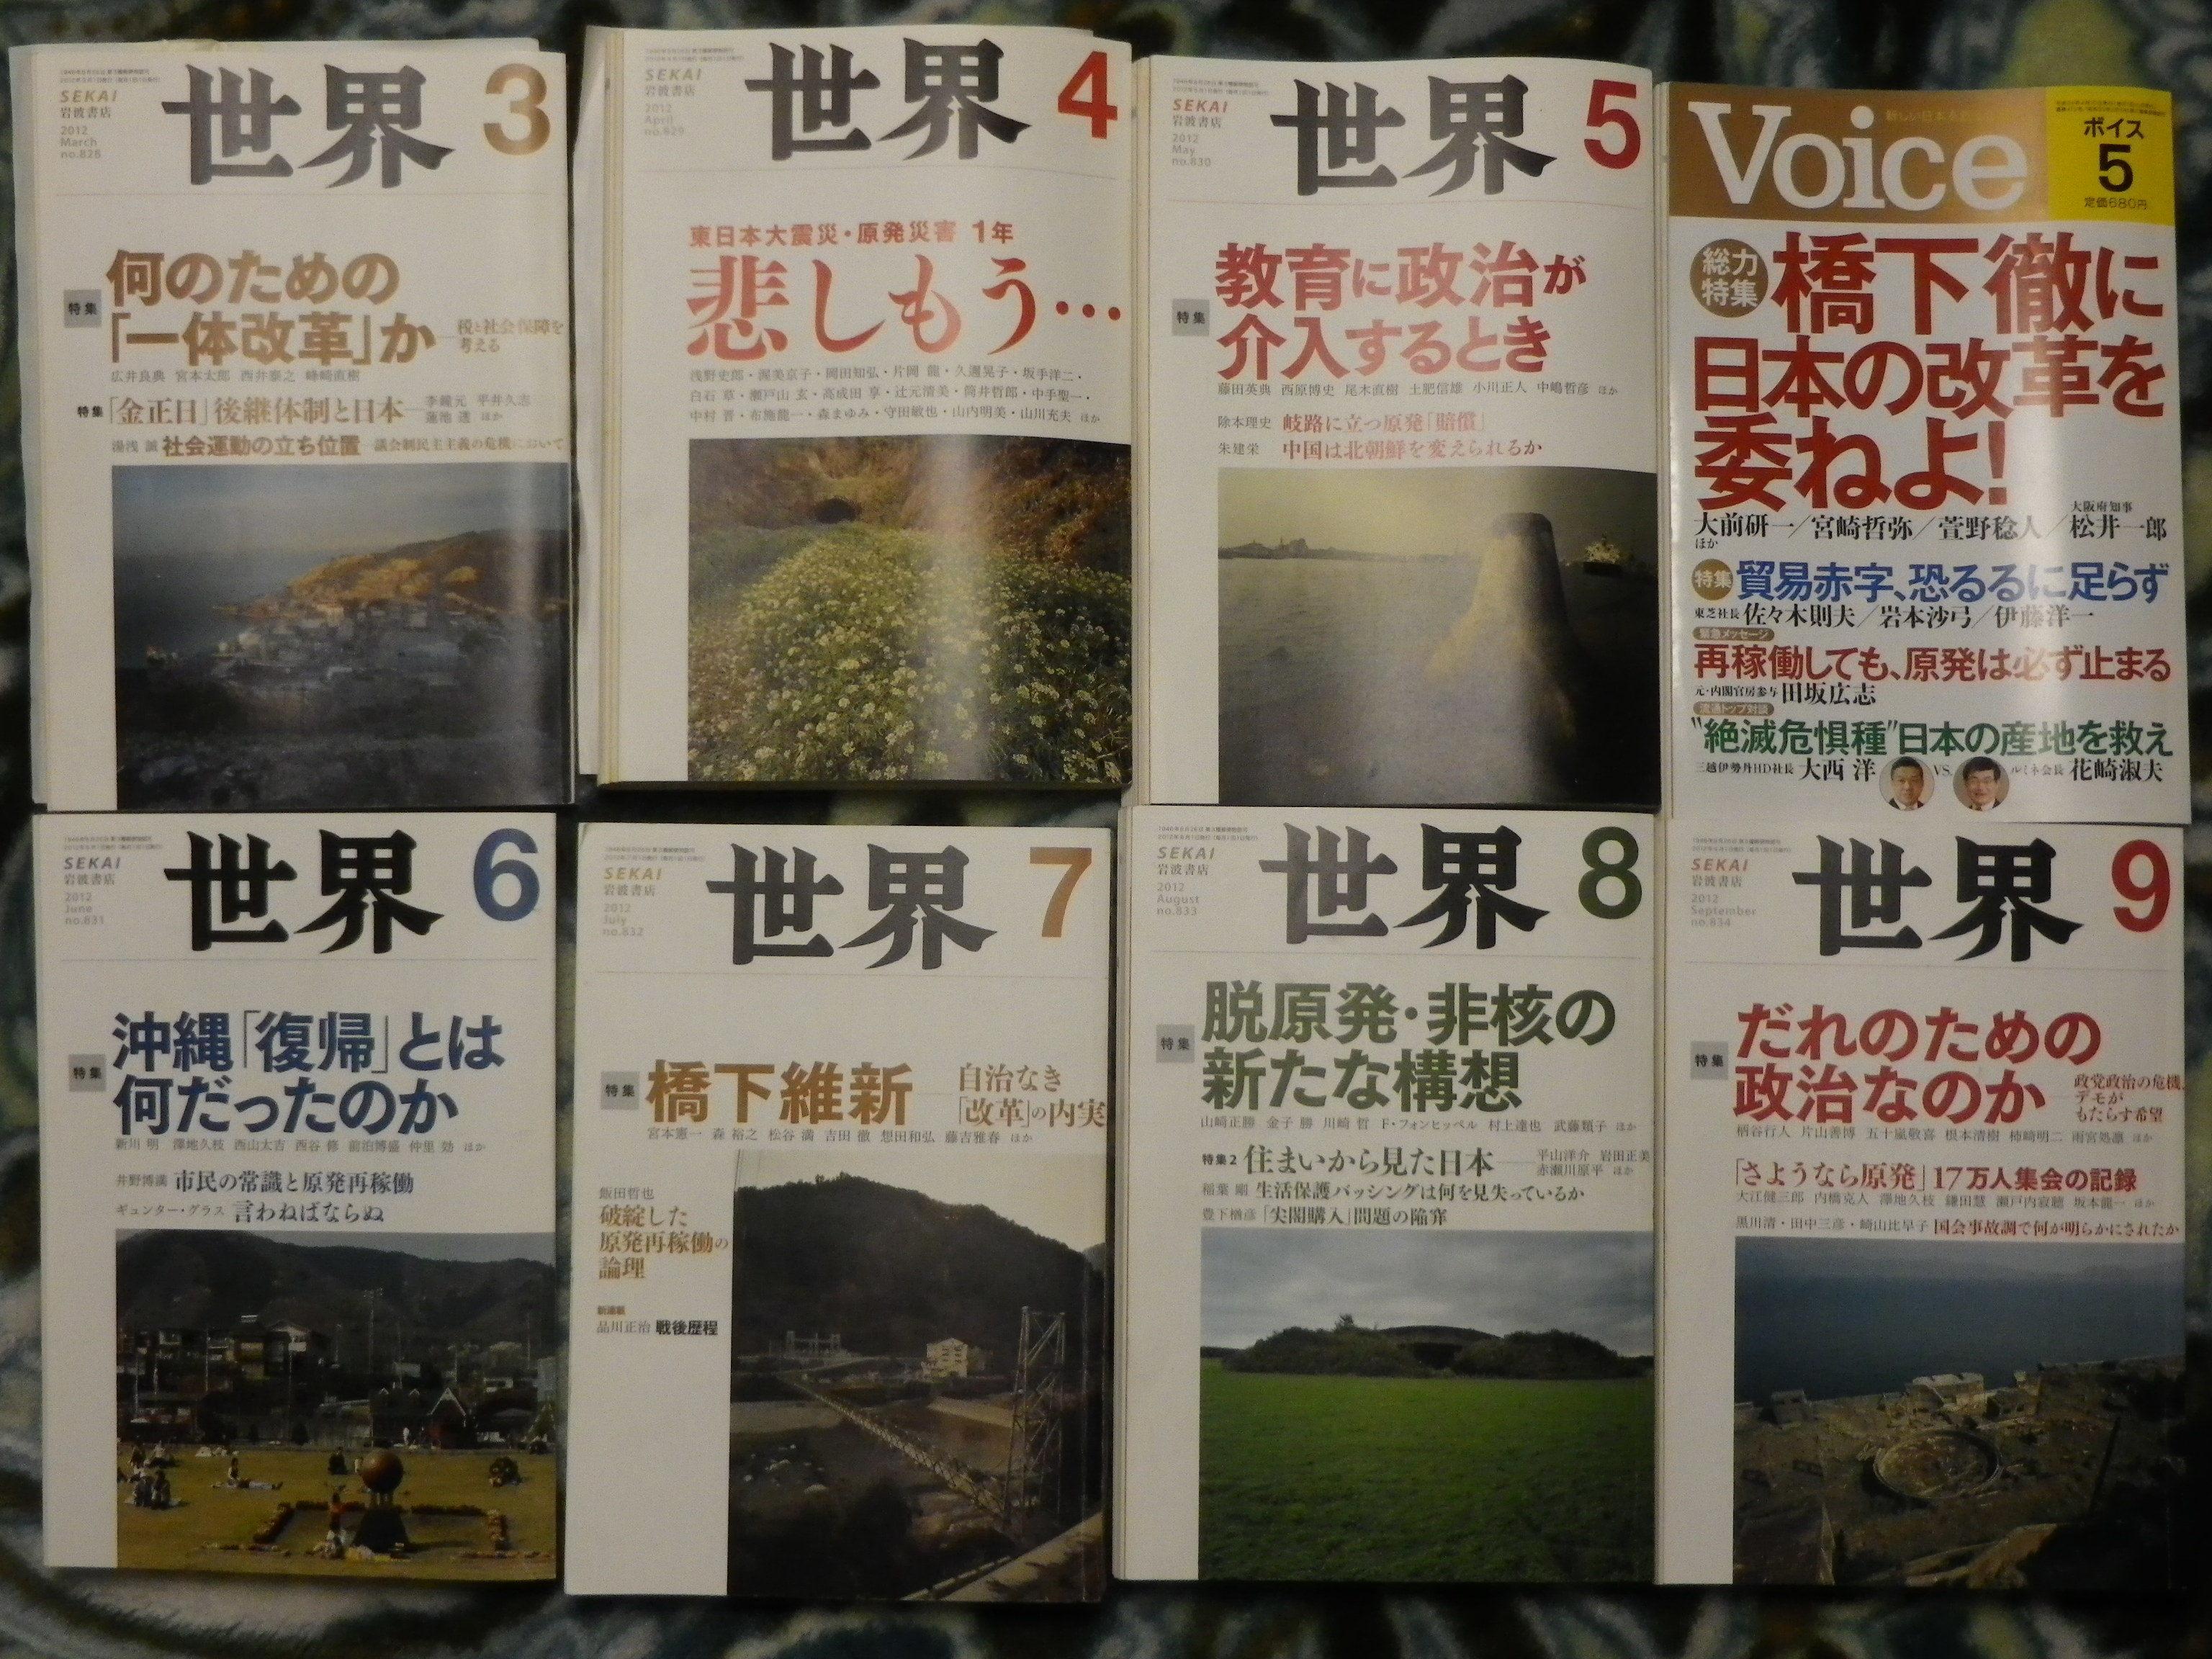 2012年の雑誌「世界」他。